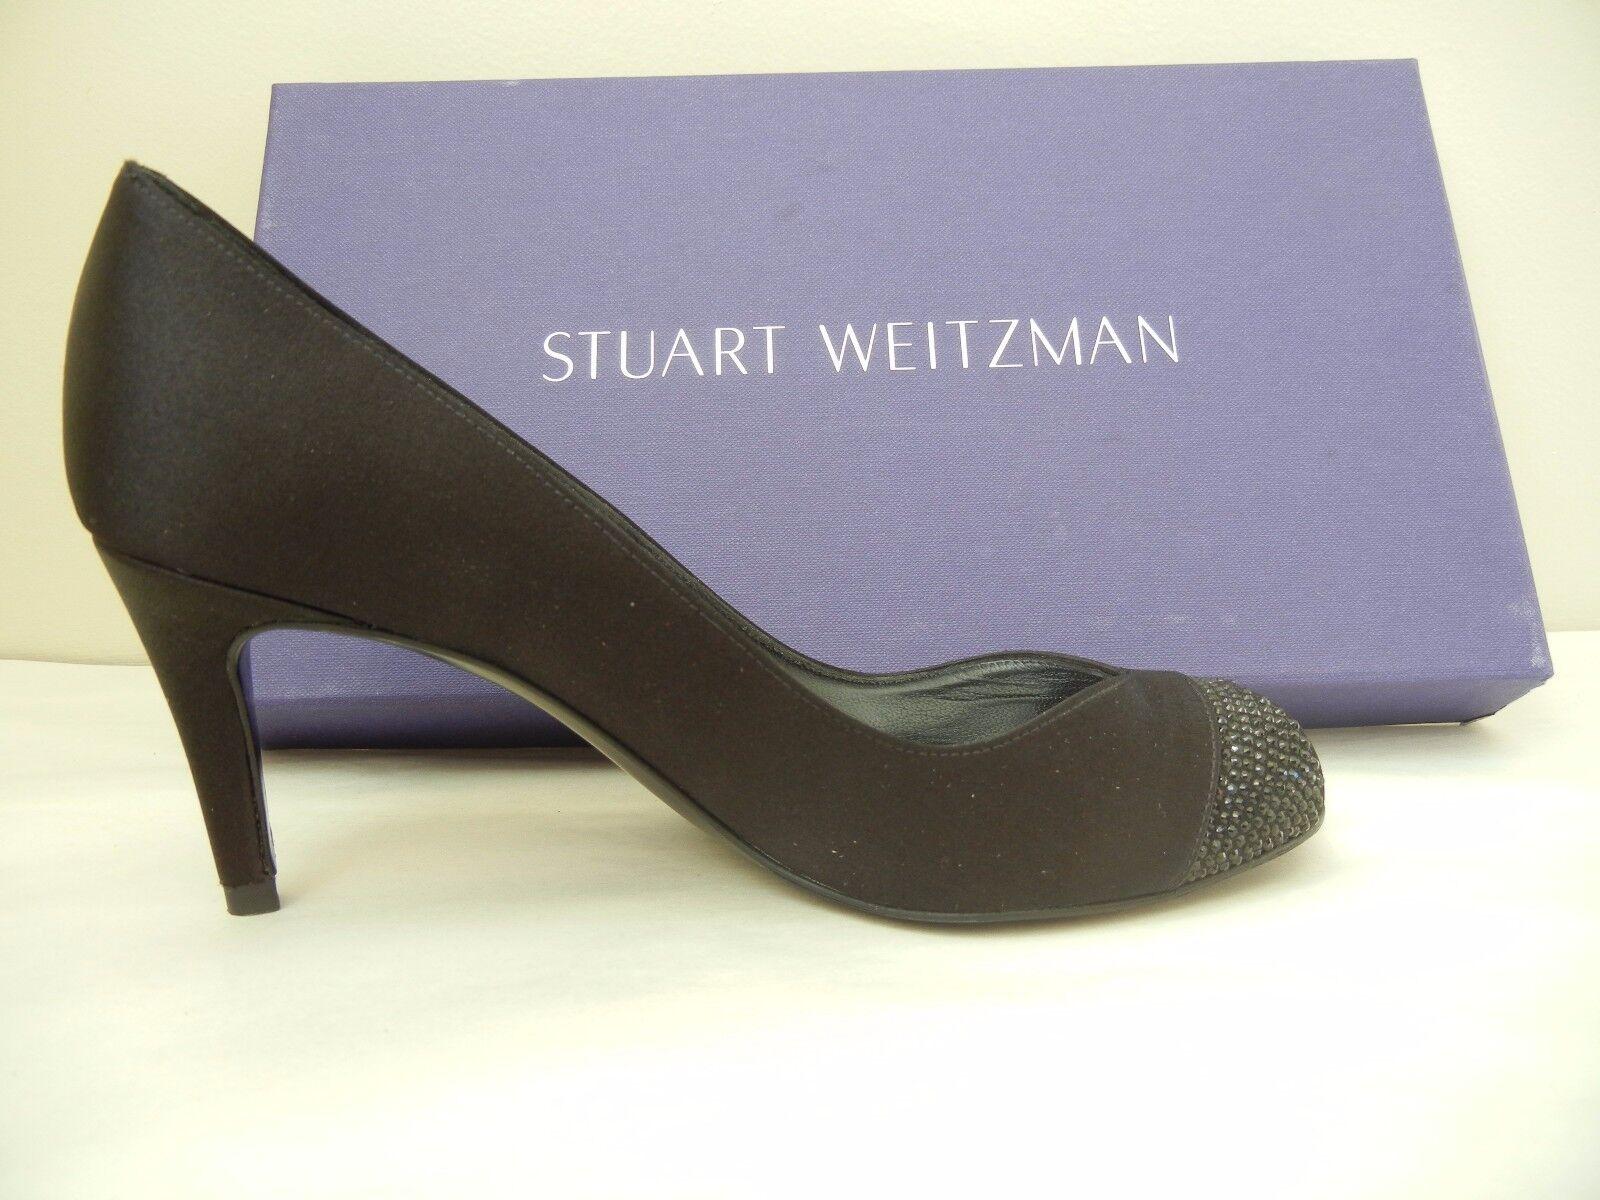 Womens Shoes - Stuart Weitzman - Marvel - Black Satin Size - Size Satin 7.5M - NWB 3eb7c8